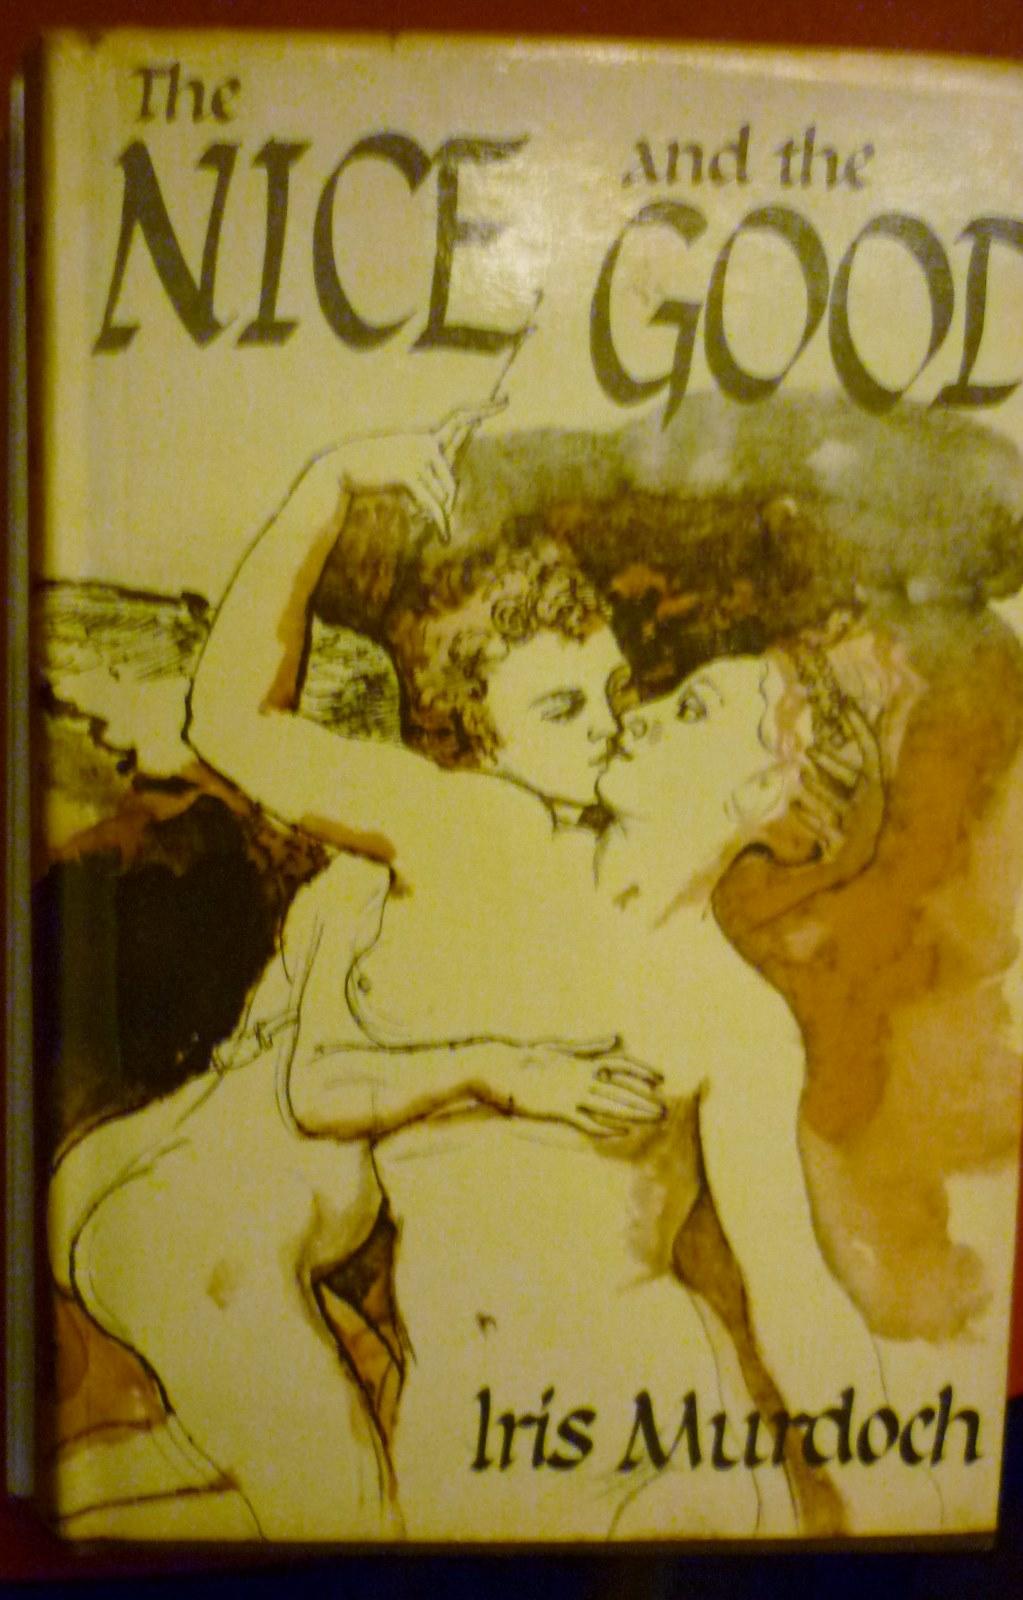 Iris Murdoch:  The Nice and the Good